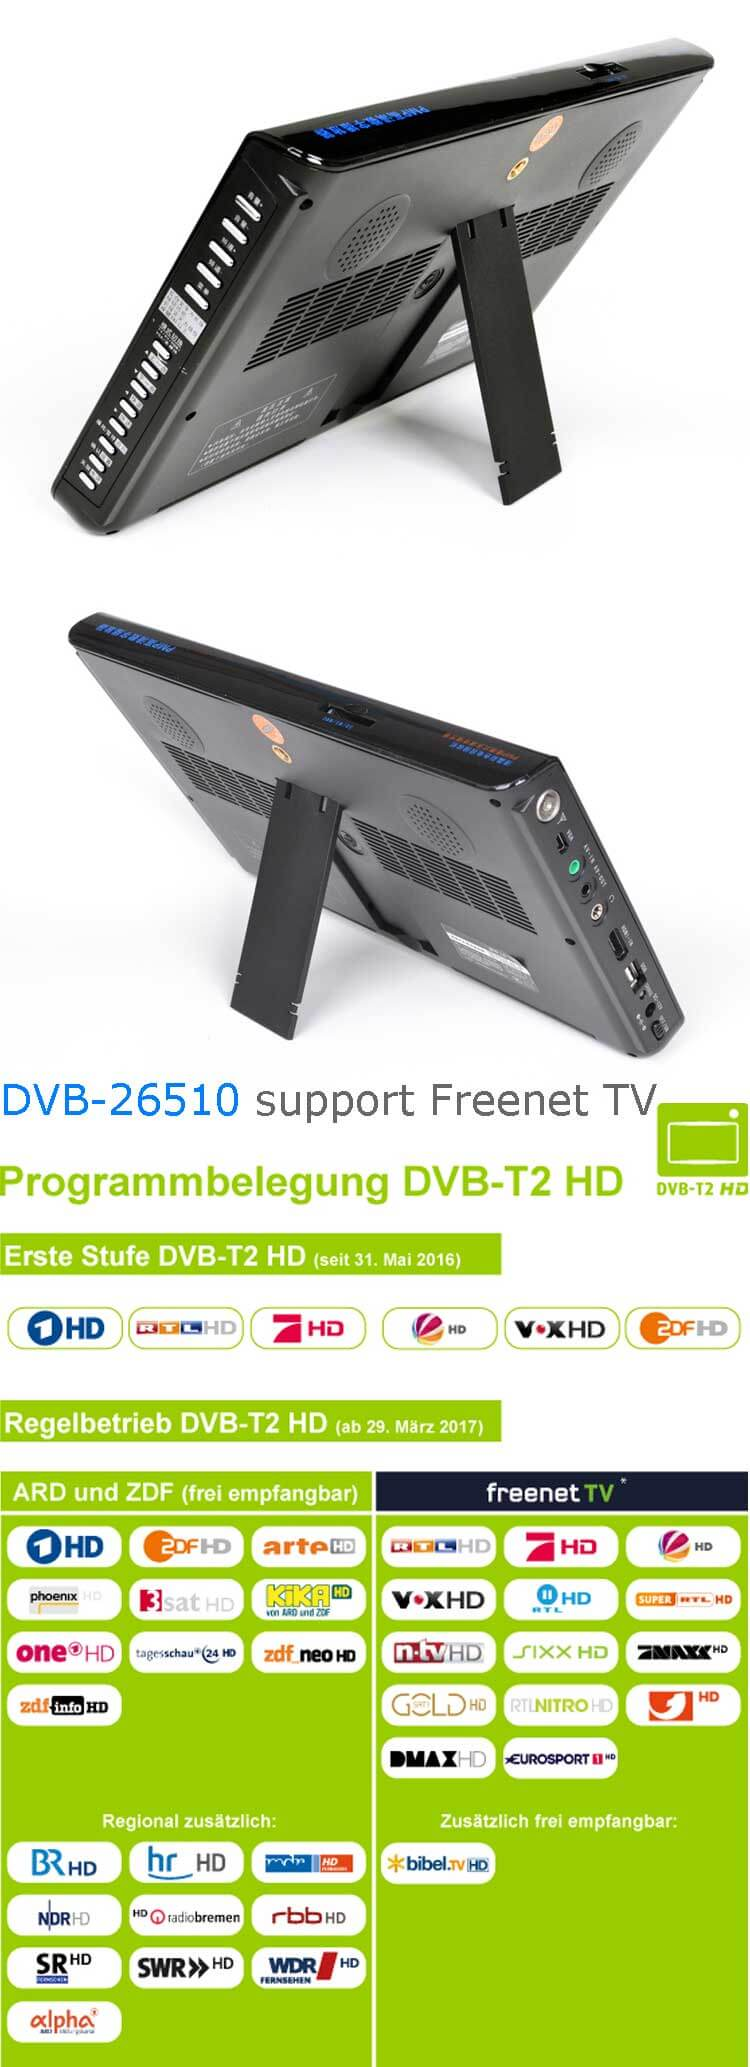 10 DVB-T2 H265 HEVC AC3 Codec Portable TV PVR Multimedia Player Analog kitchen bedroom car DVB-T26510 14